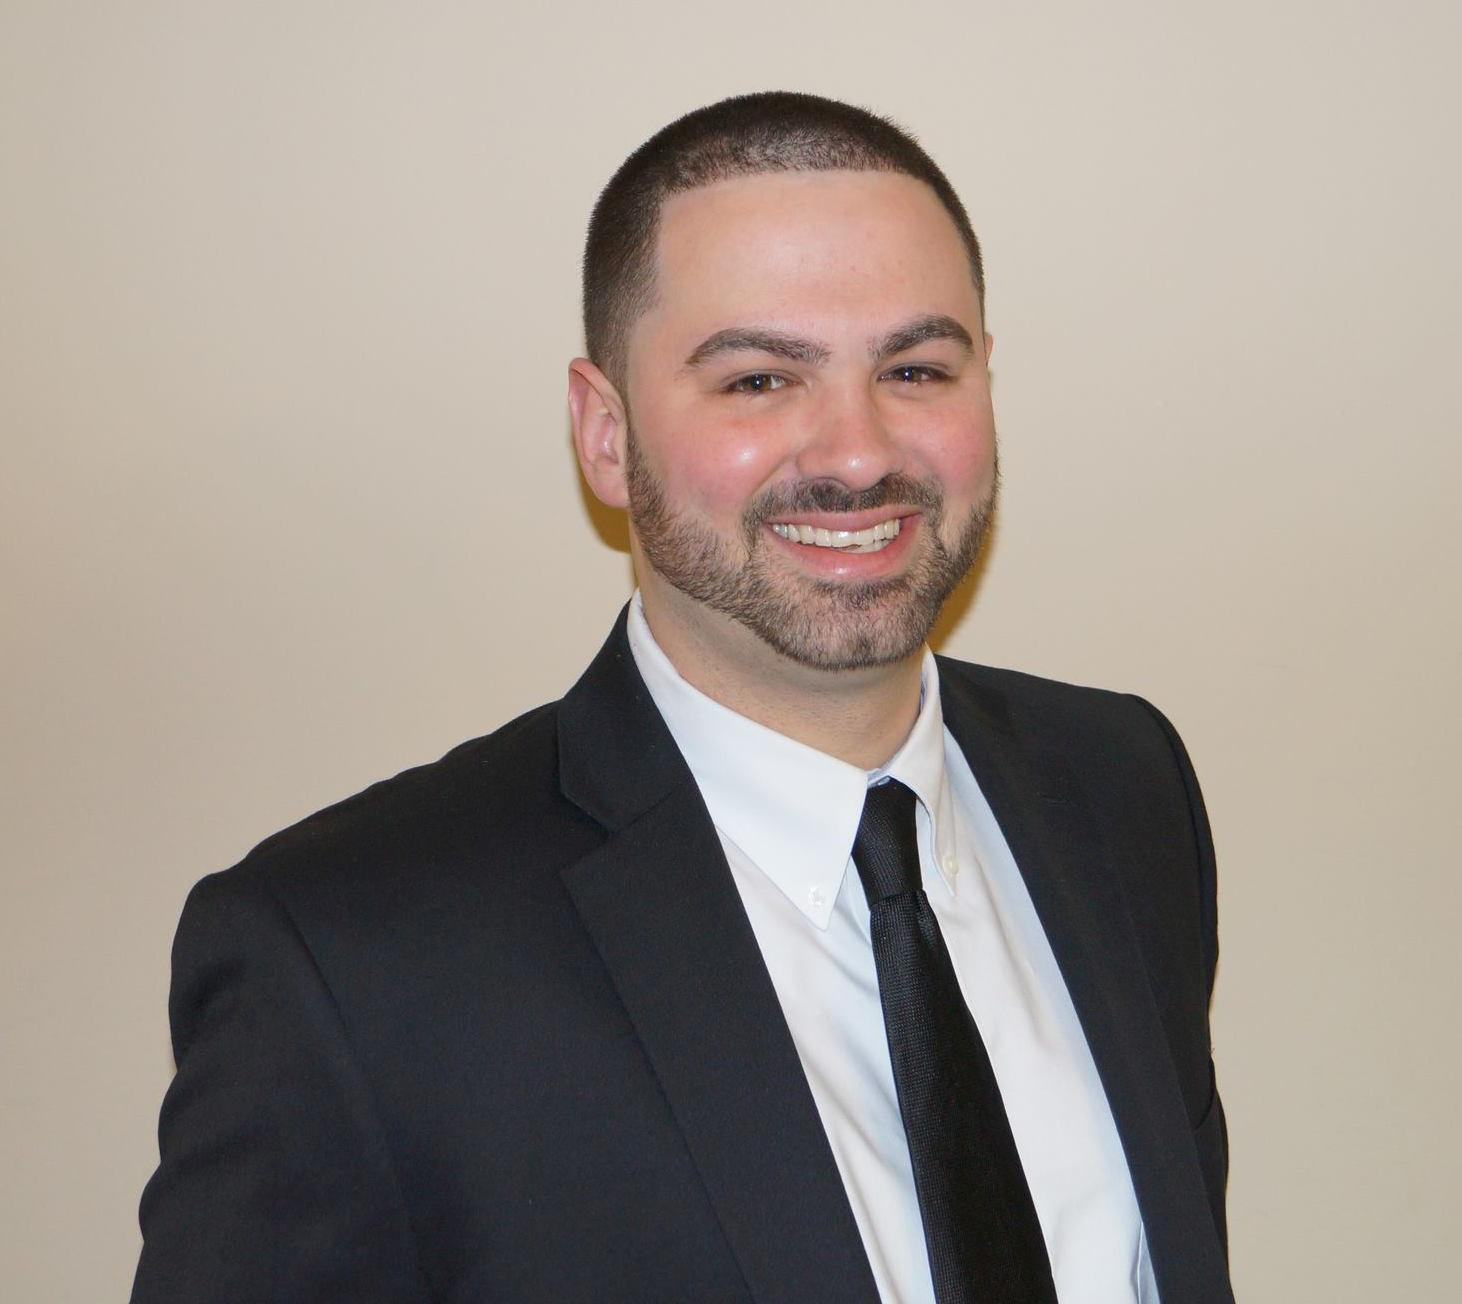 ROBERT JOSEPH BENNETT Insurance Agent